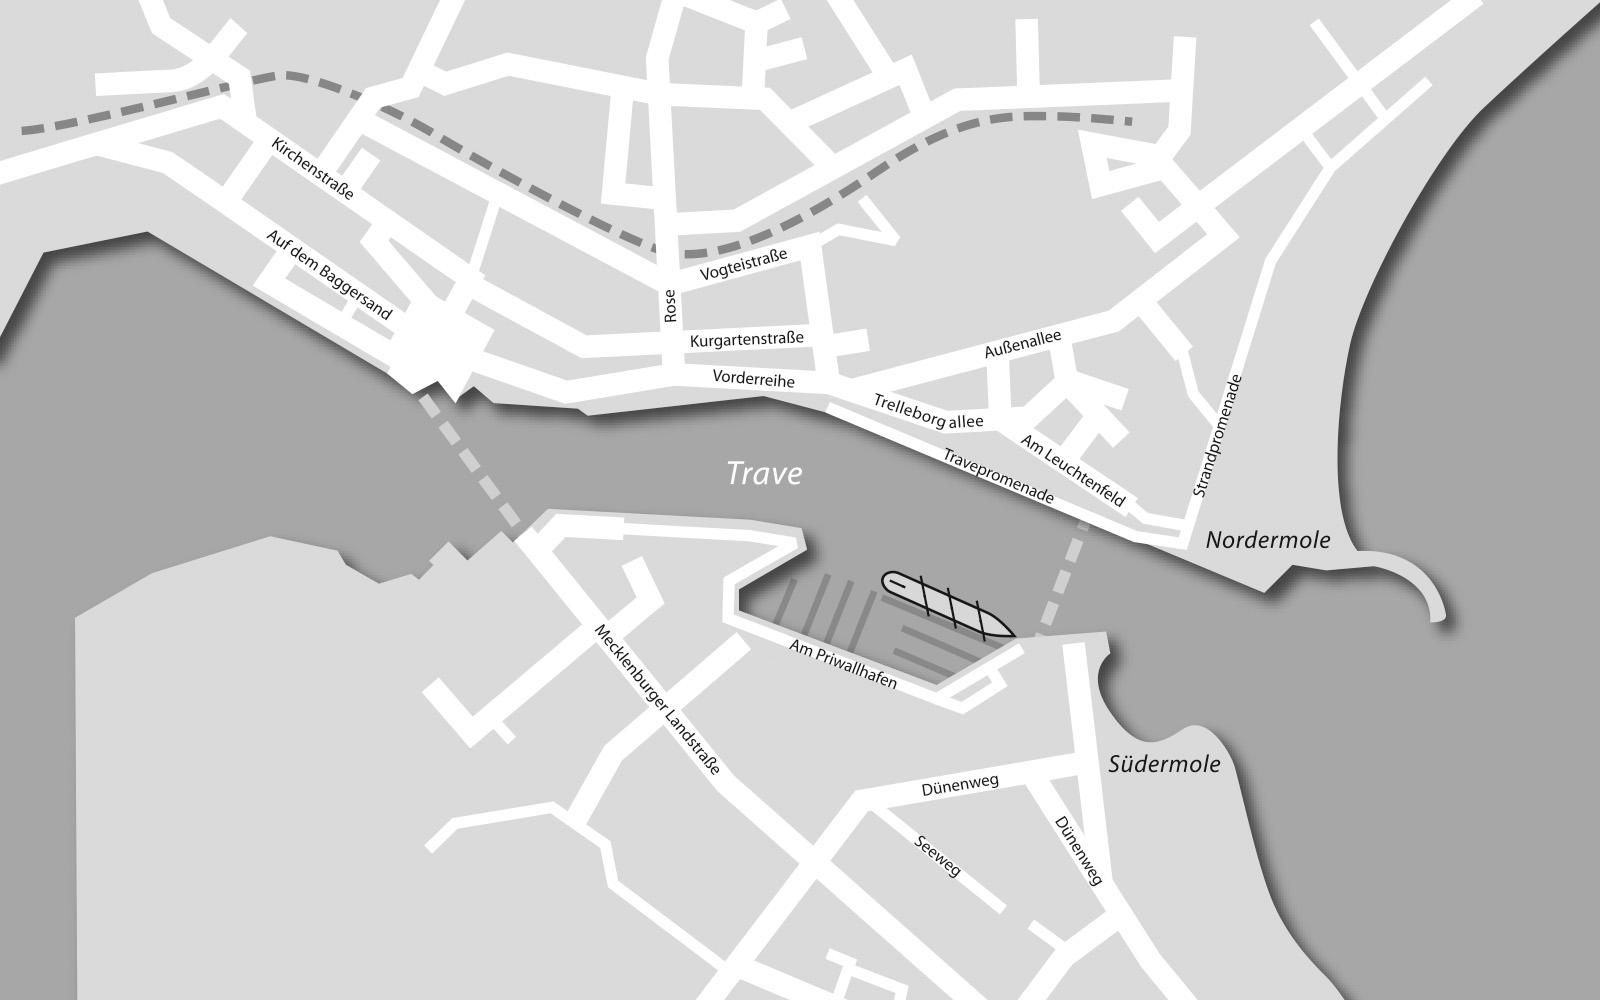 Illustration des Veranstaltungsortes